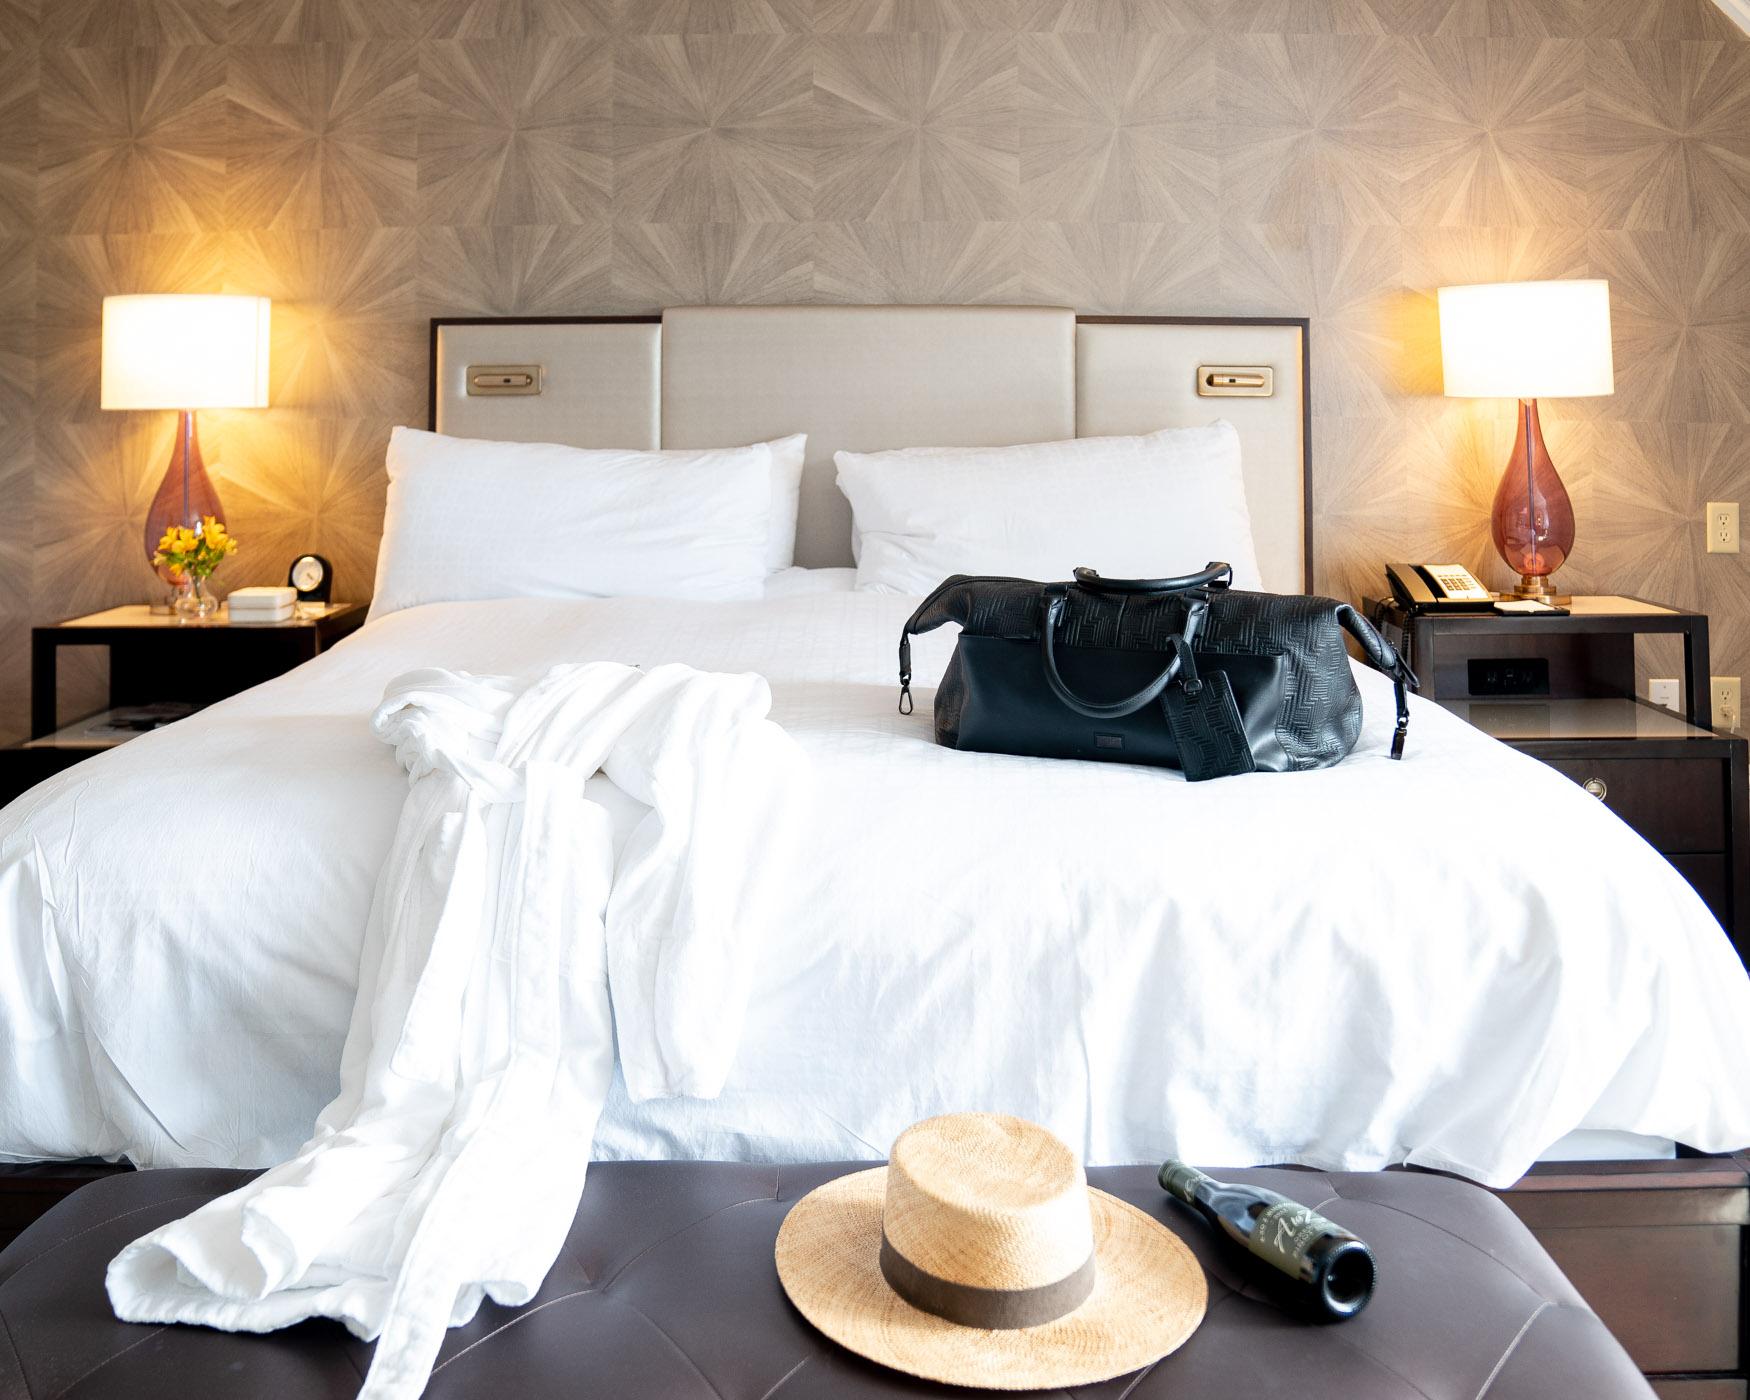 claremont-hotel-berkeley-3.jpg